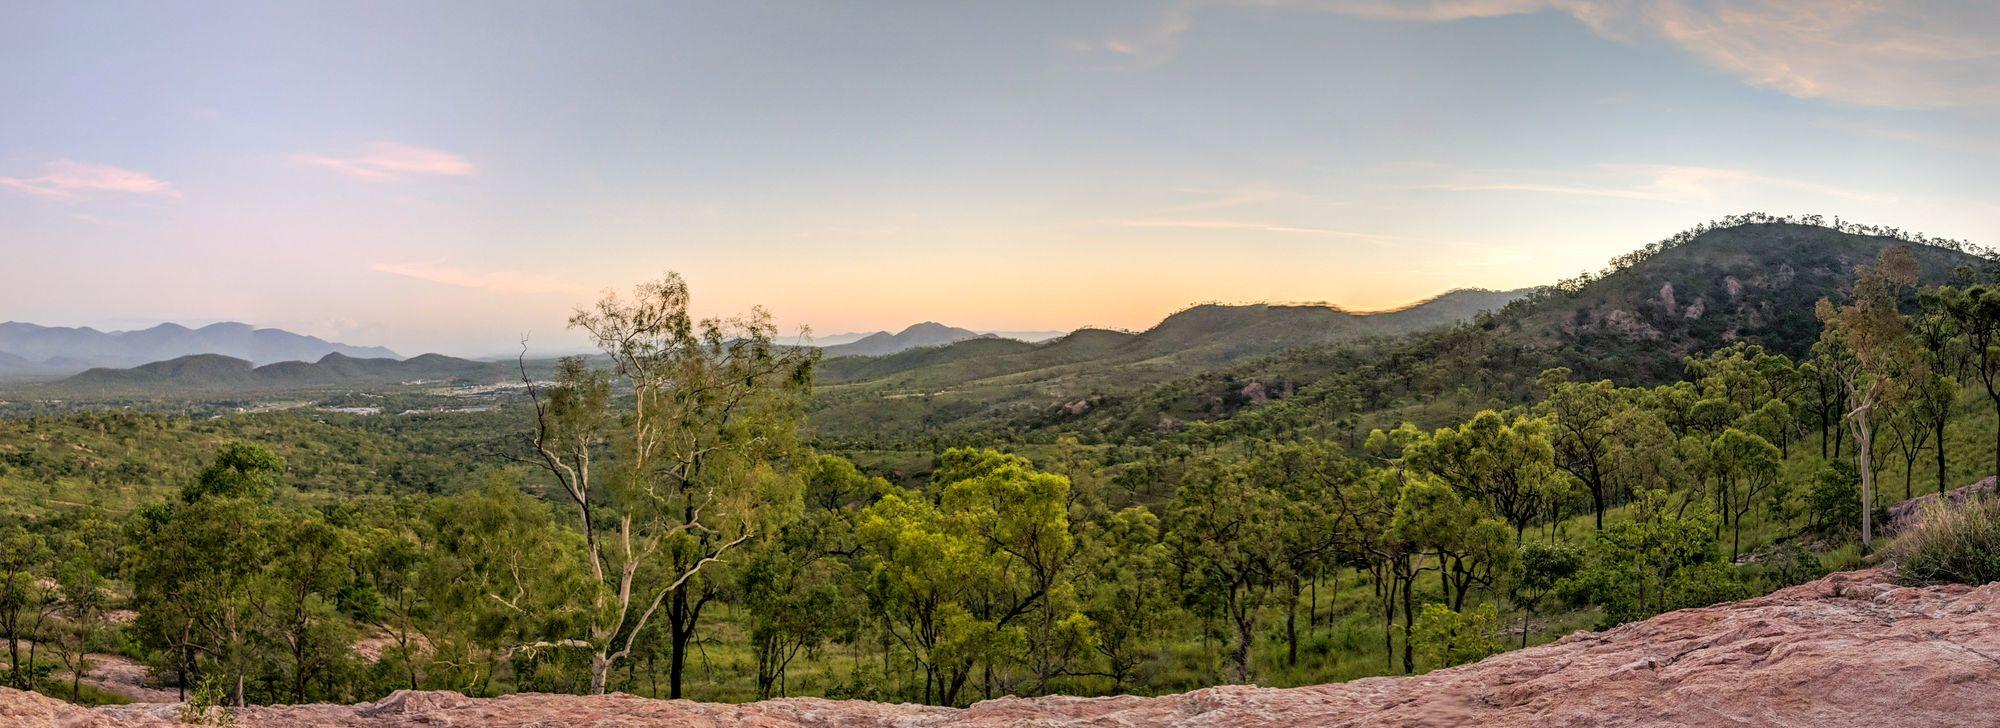 Wulguru Hills sunset views